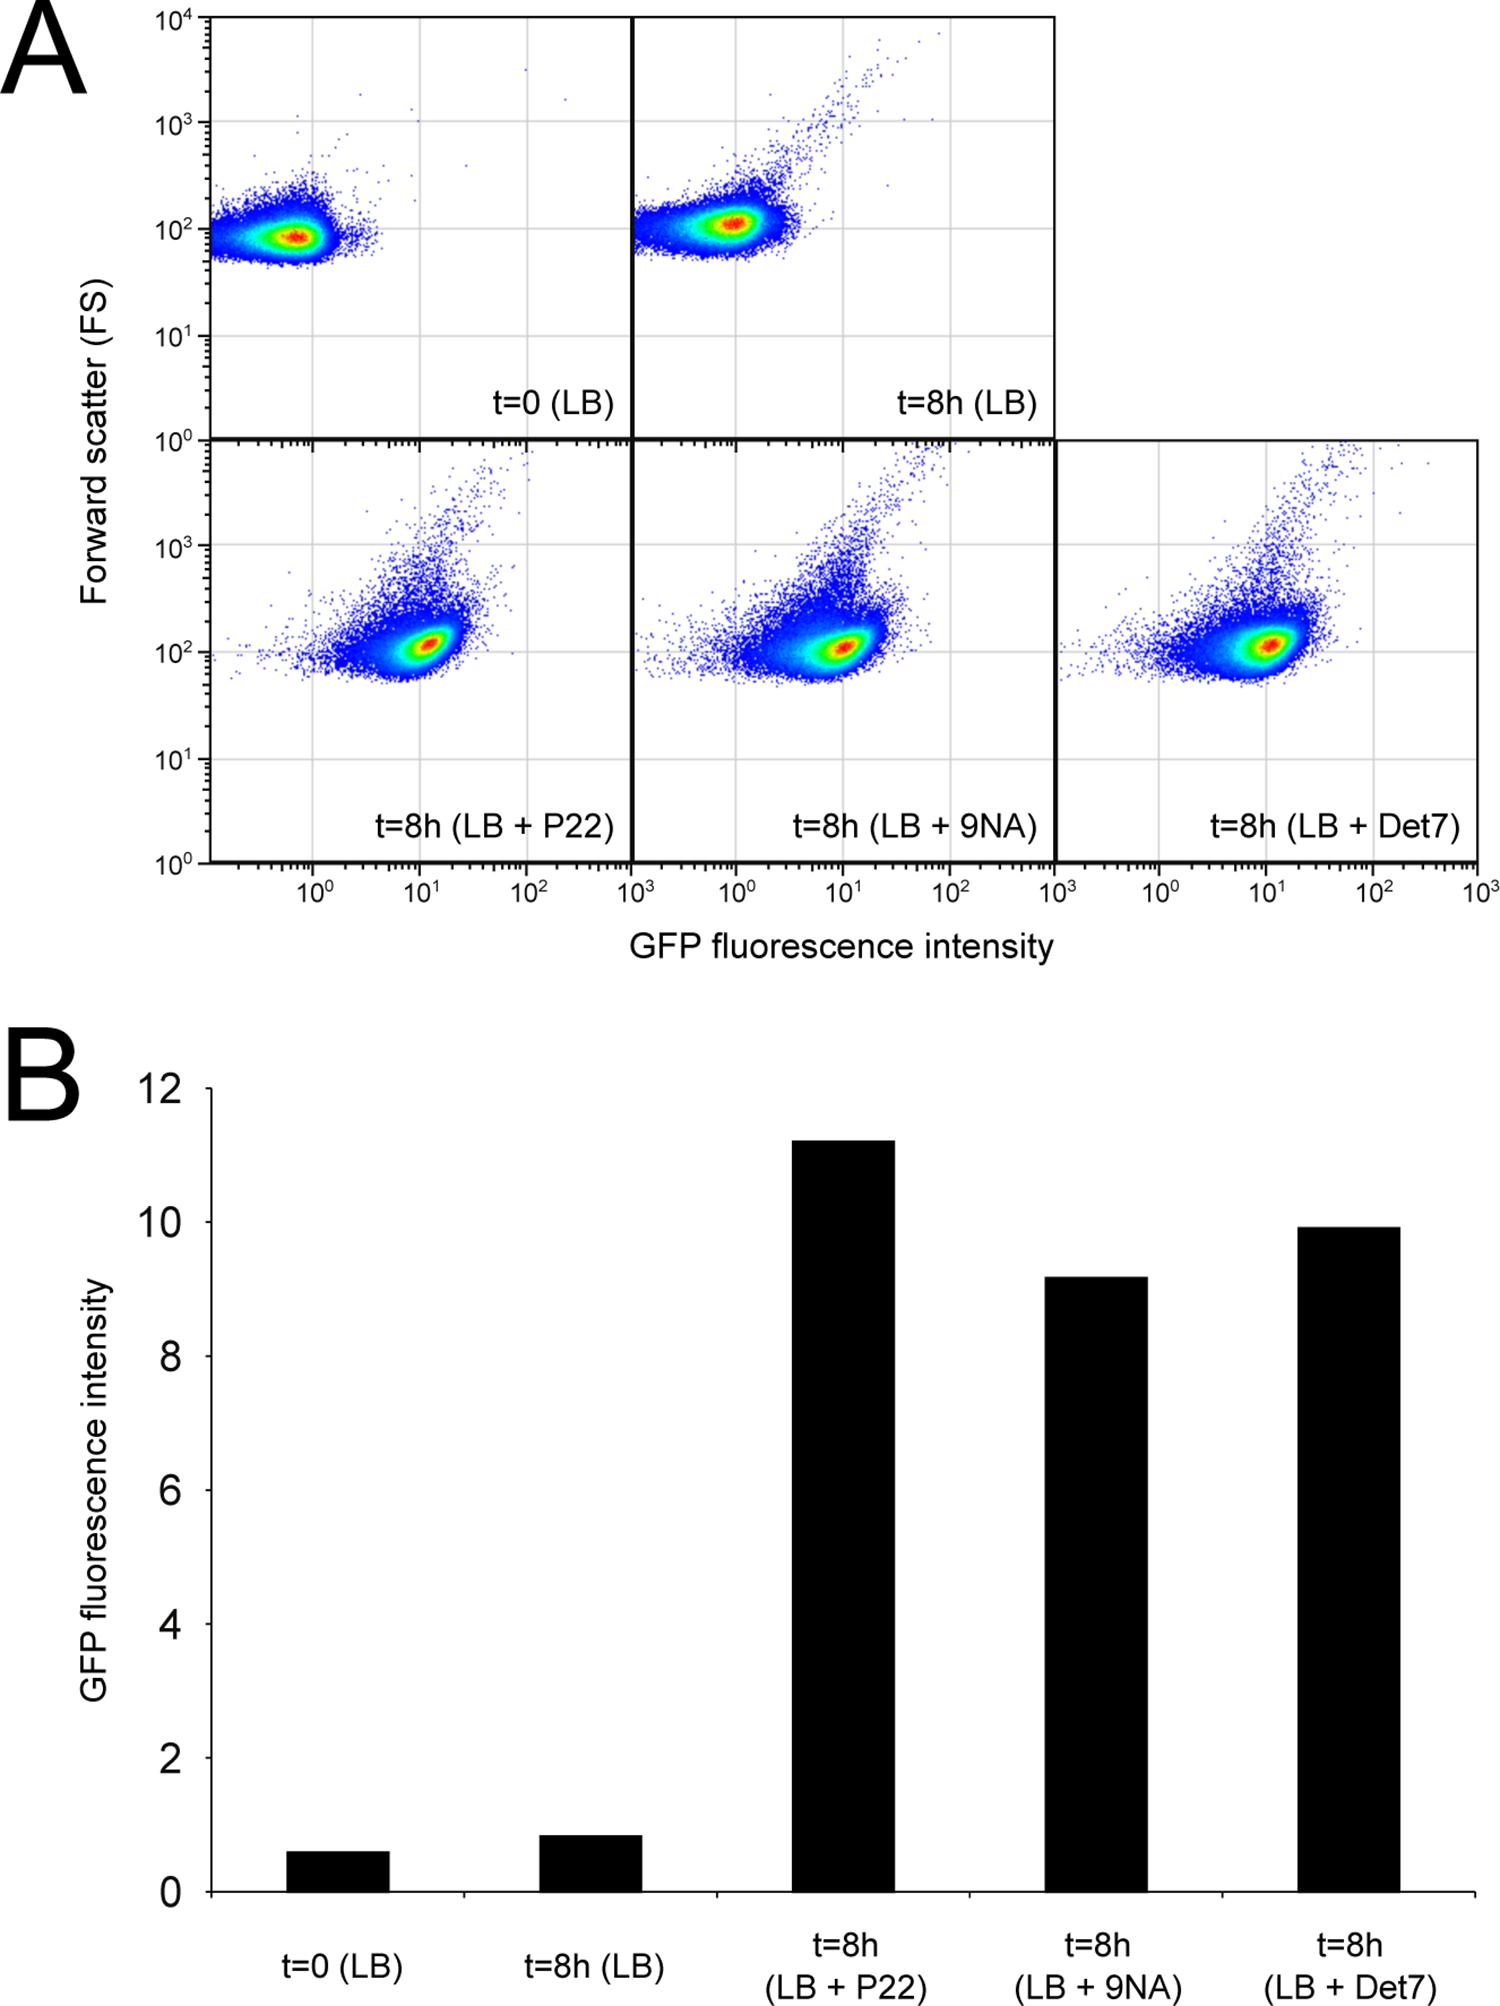 Flow cytometry analysis of <i>opvAB</i><sup>OFF</sup> and <i>opvAB</i><sup>ON</sup> subpopulations.